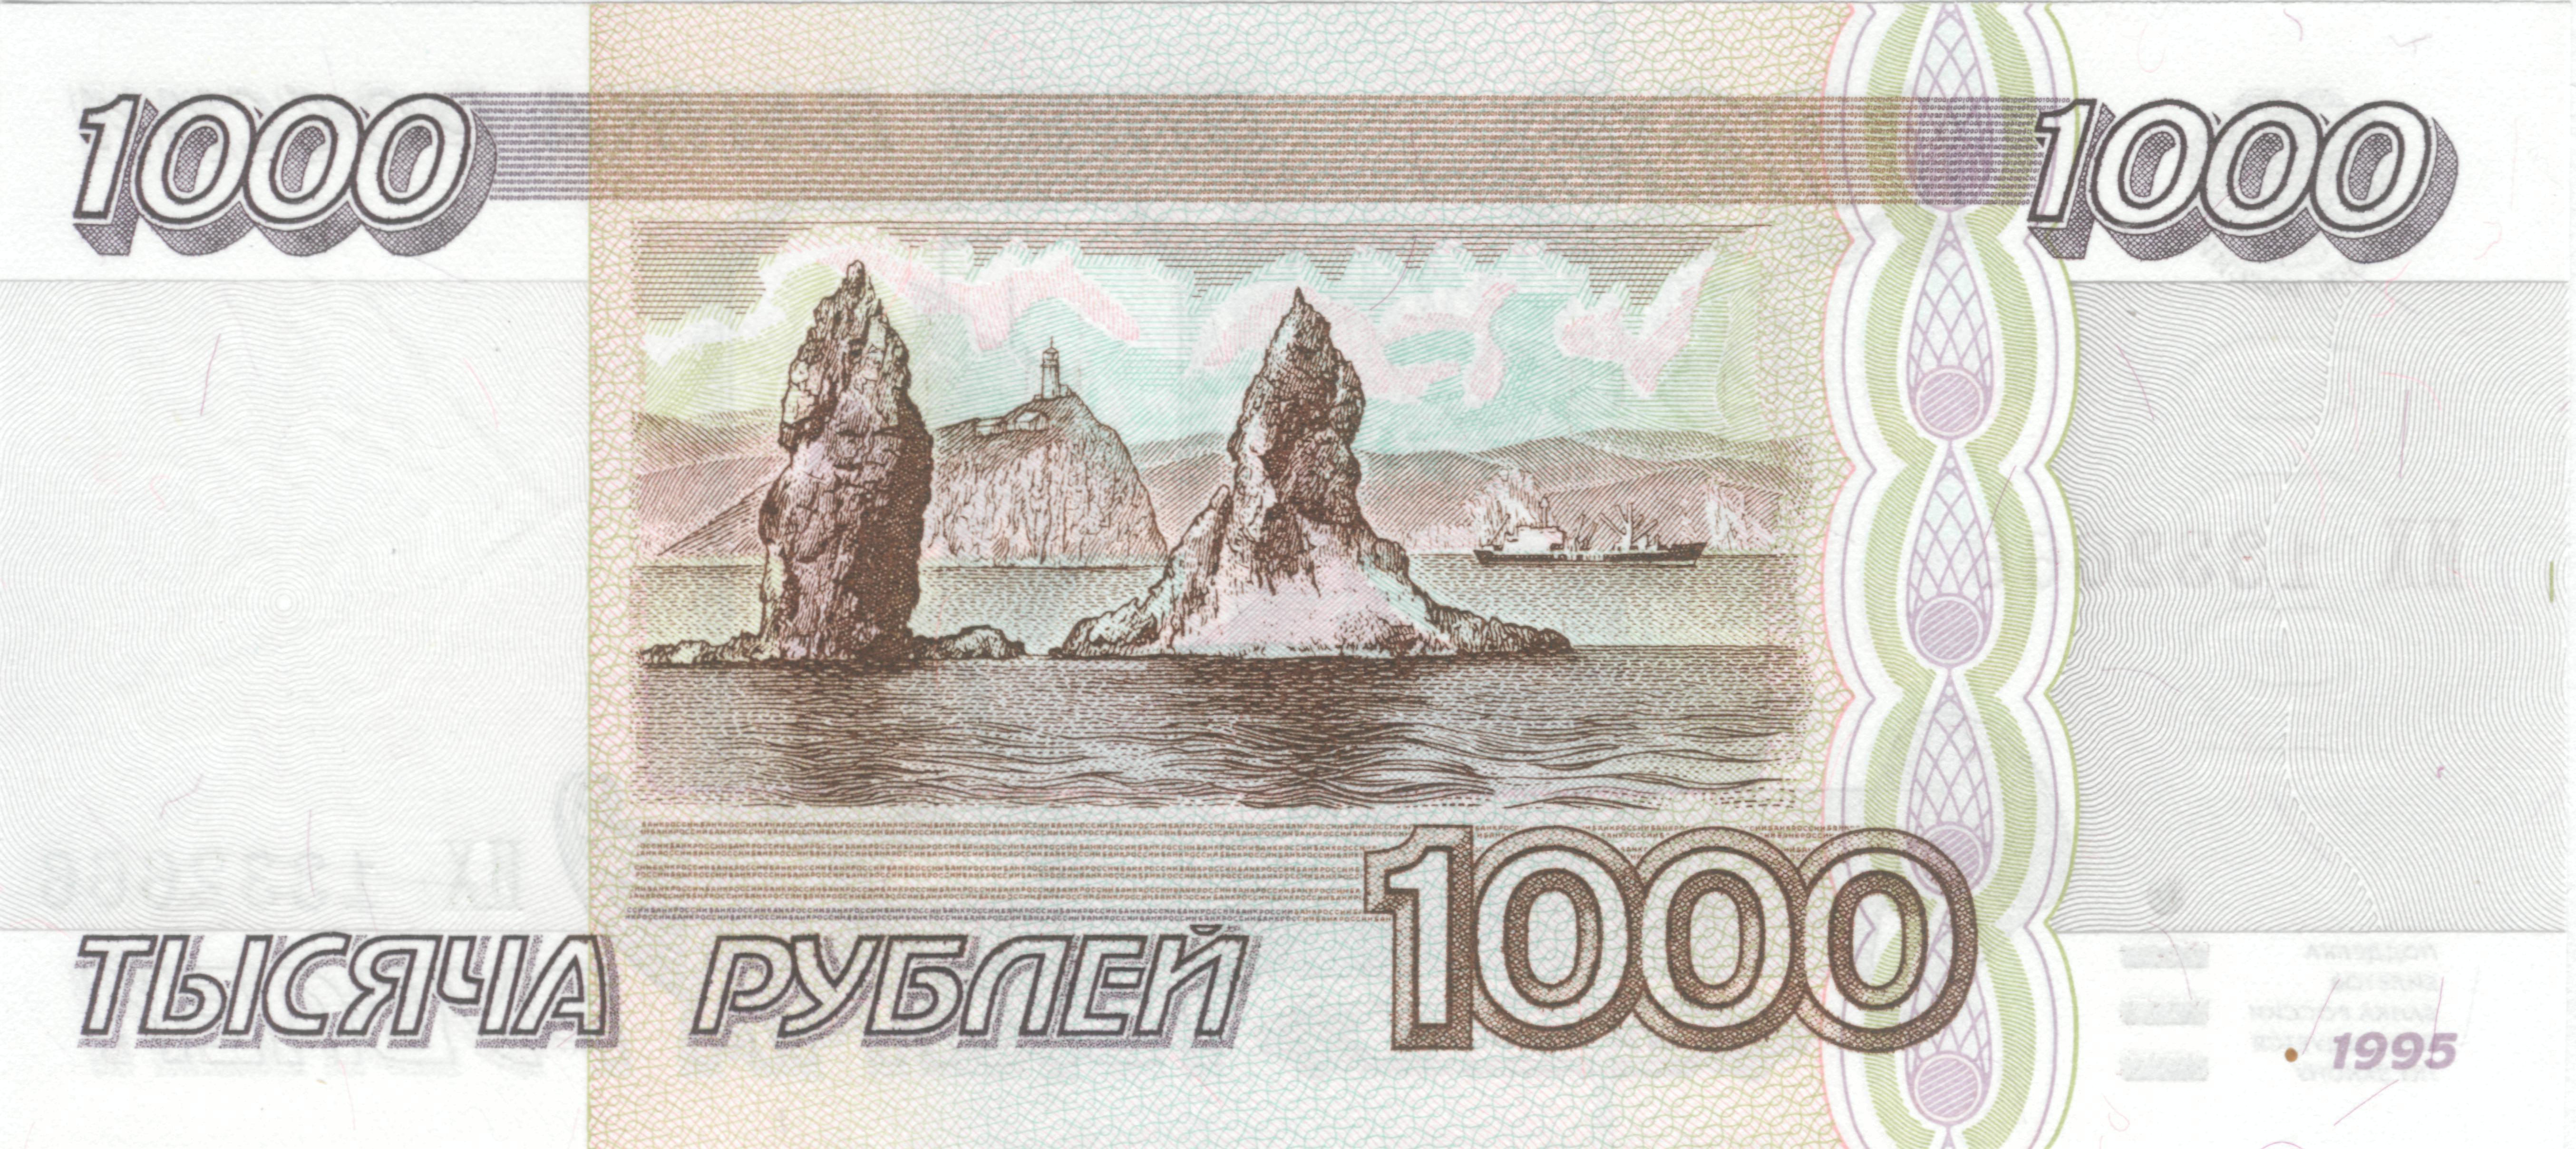 File:Banknote 1000 rubles (1995) Back.jpg - Wikimedia Commons